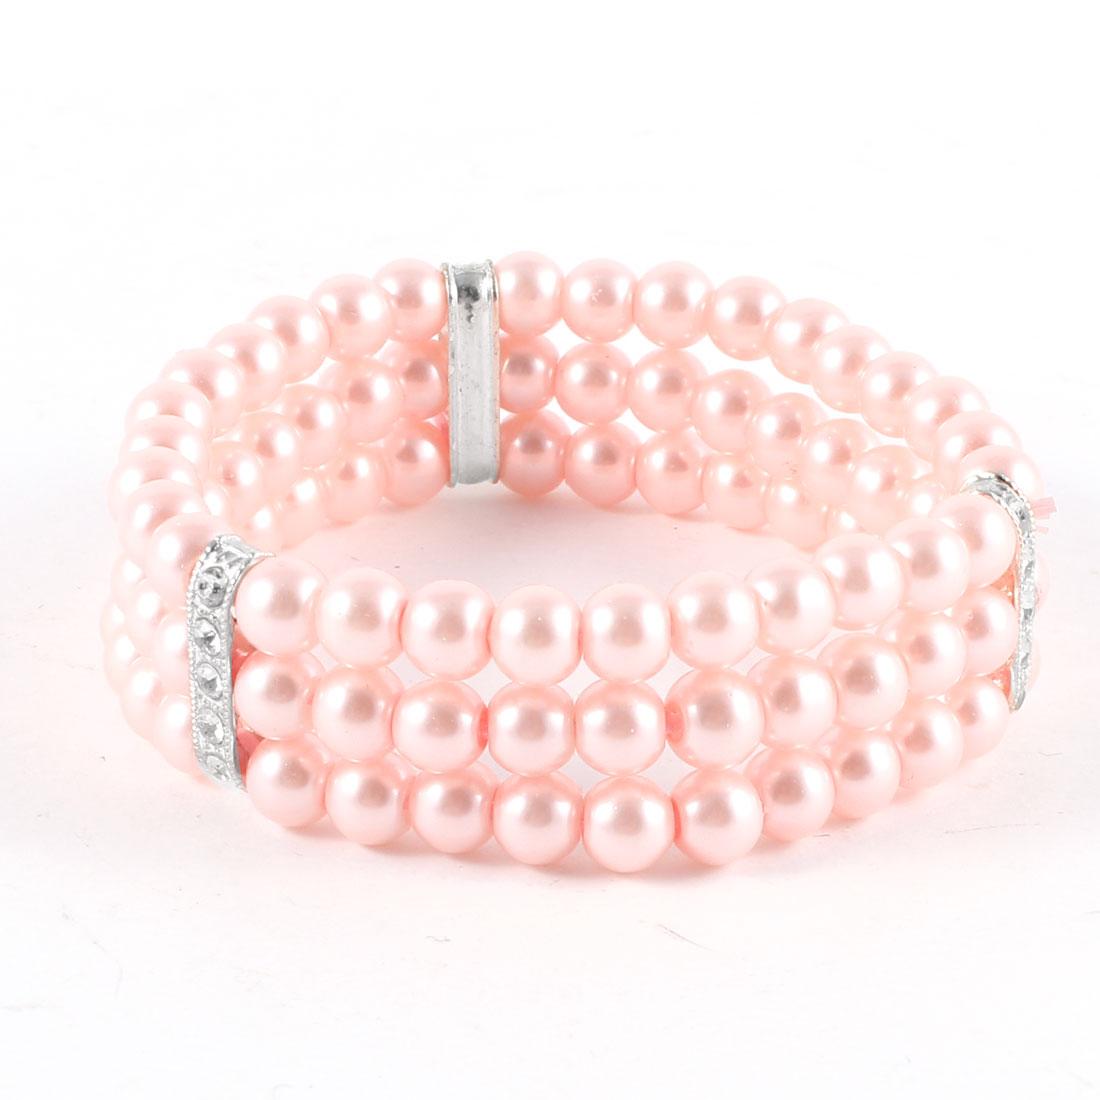 Women Tri Rows Imitation Pearl Rhinestones Detail Stretchy Wrist Bracelet Pink